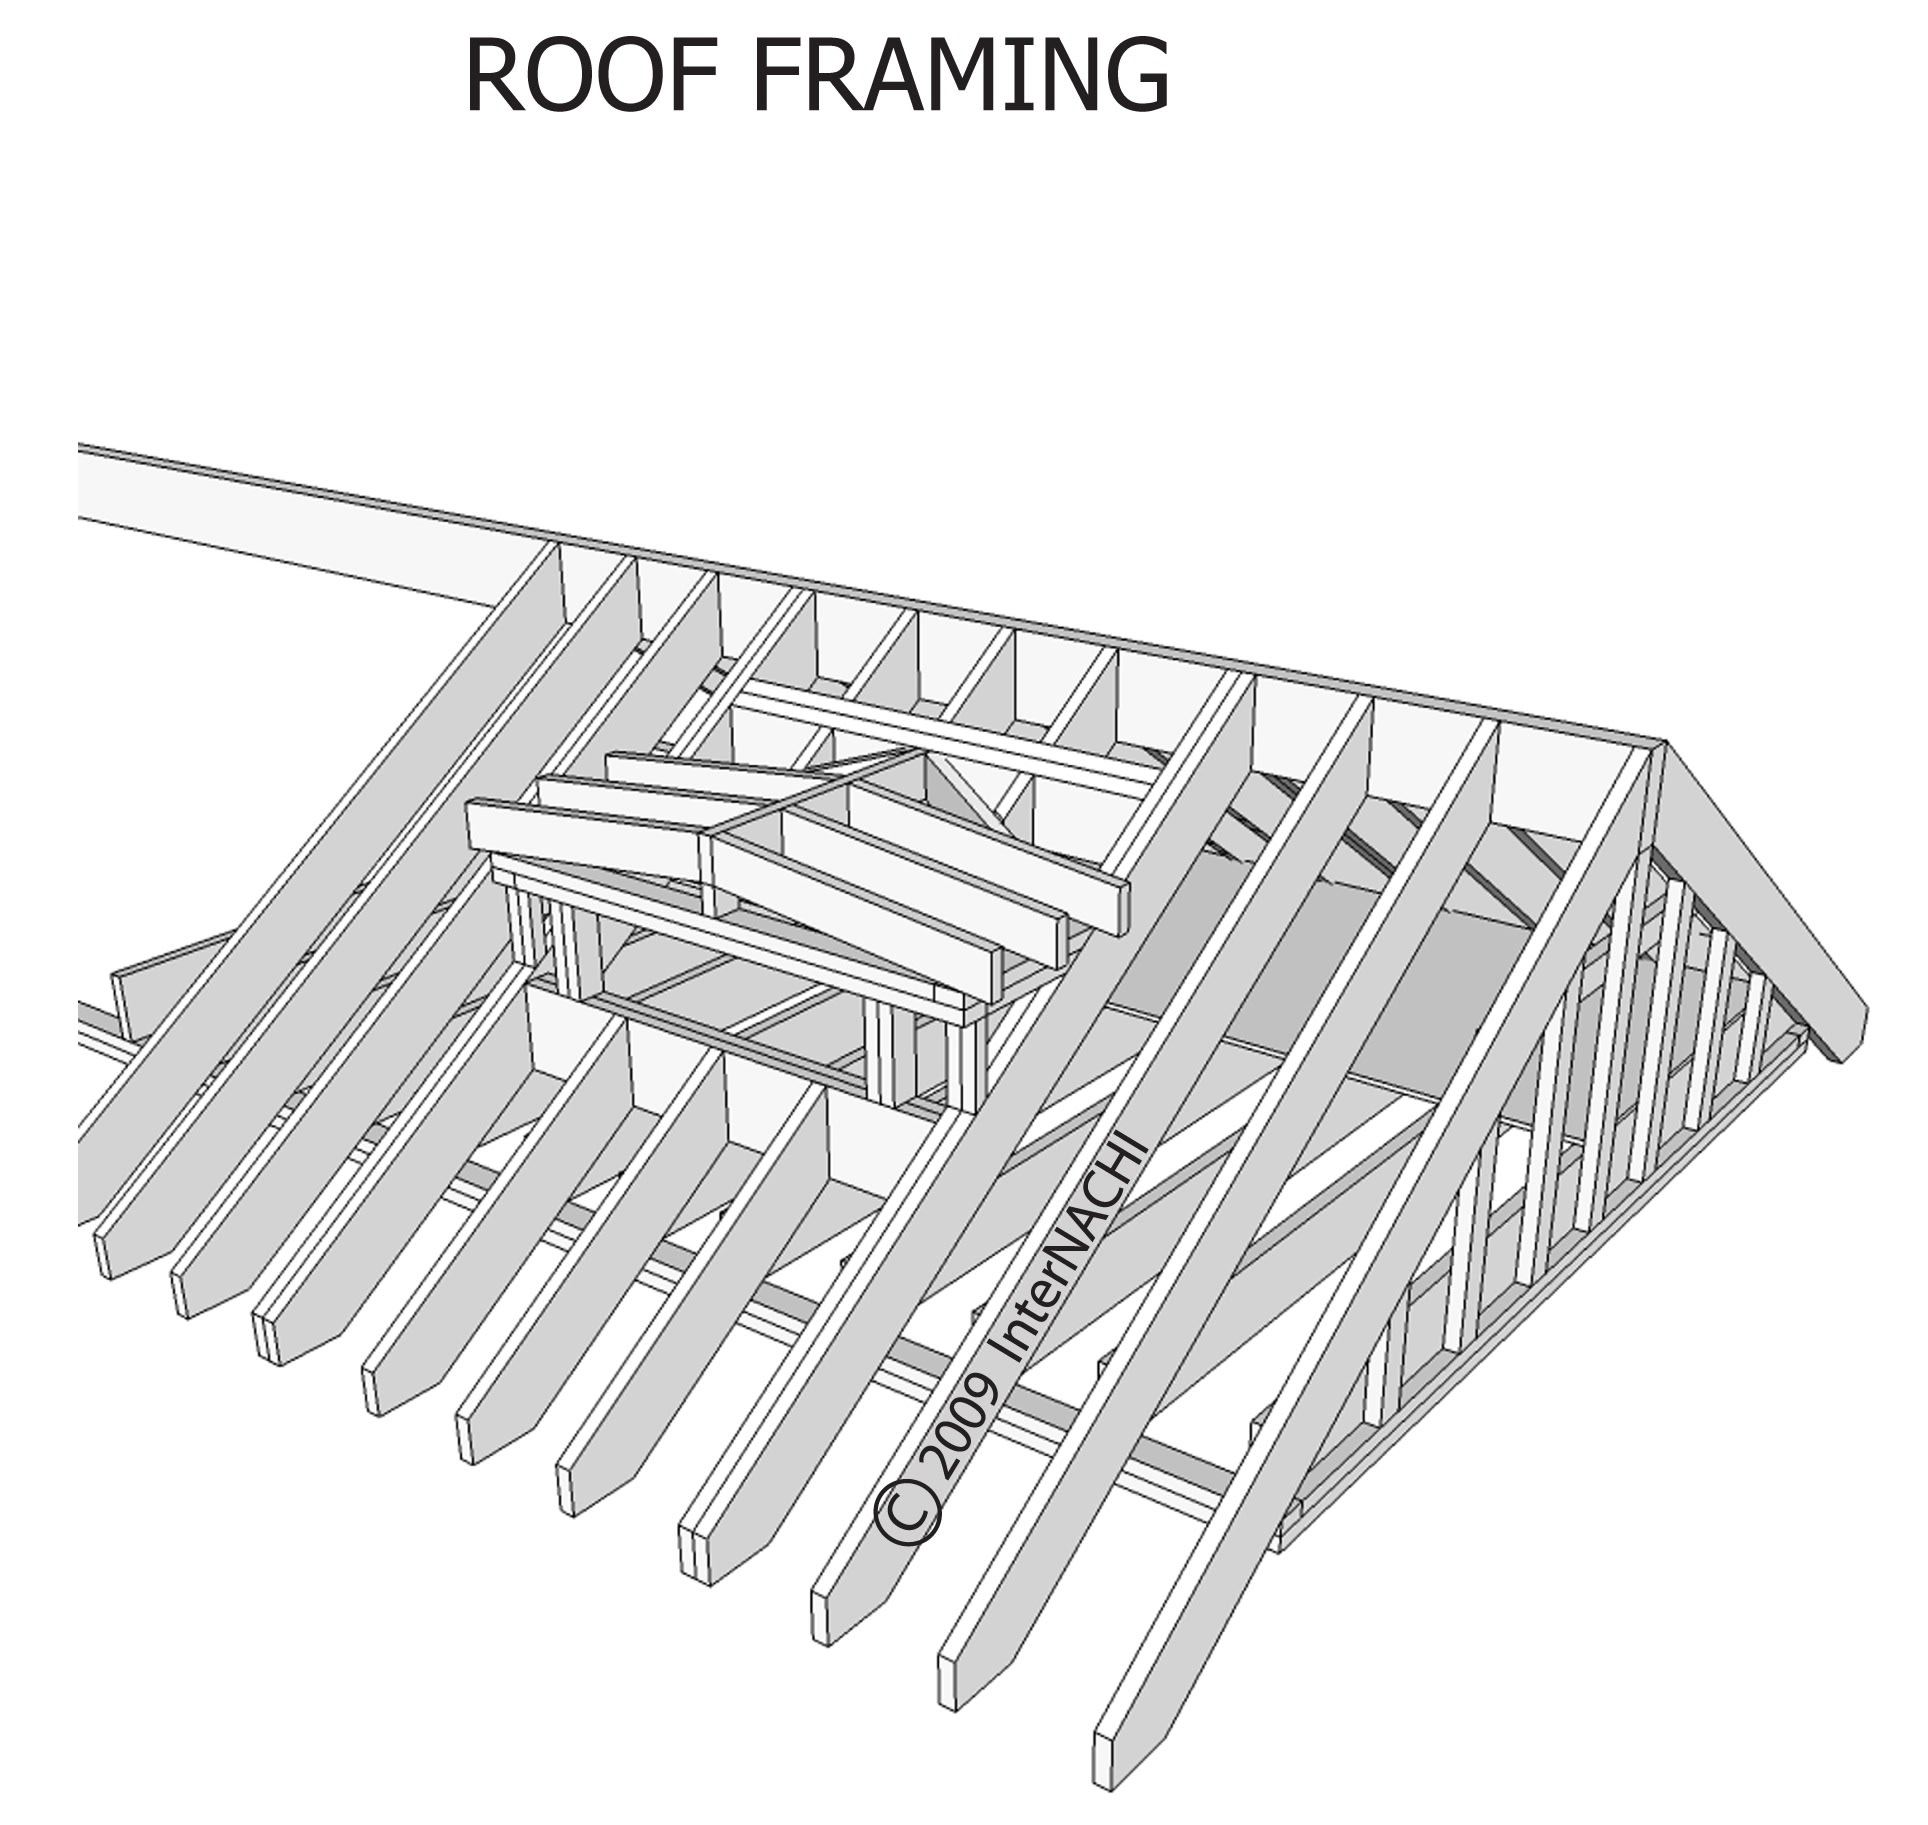 Roof framing.